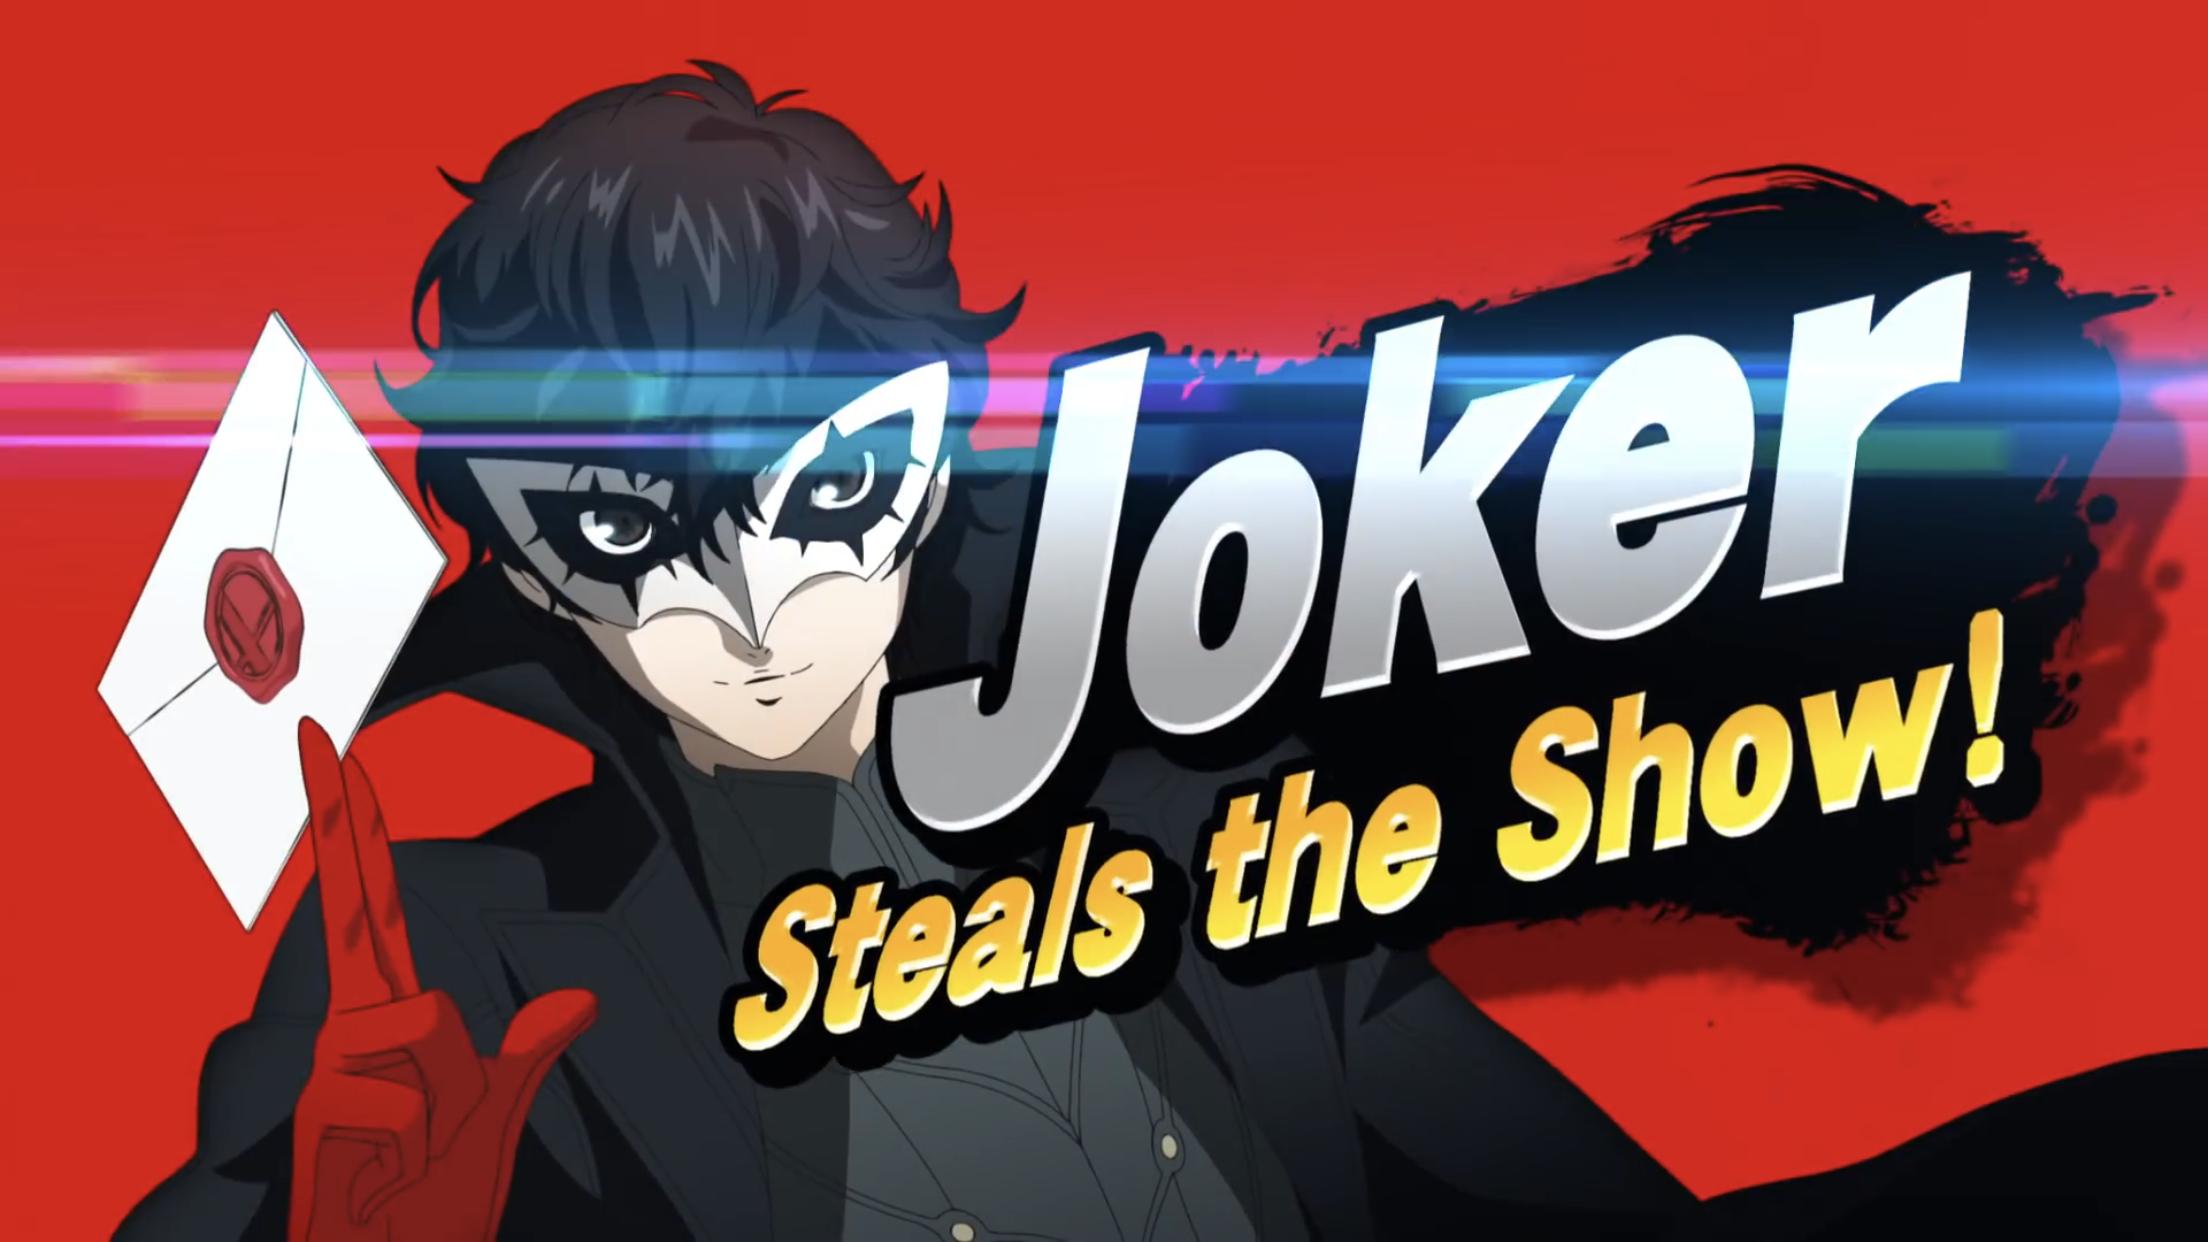 Joker Joins The Battle Persona 5 Persona 5 Joker Persona